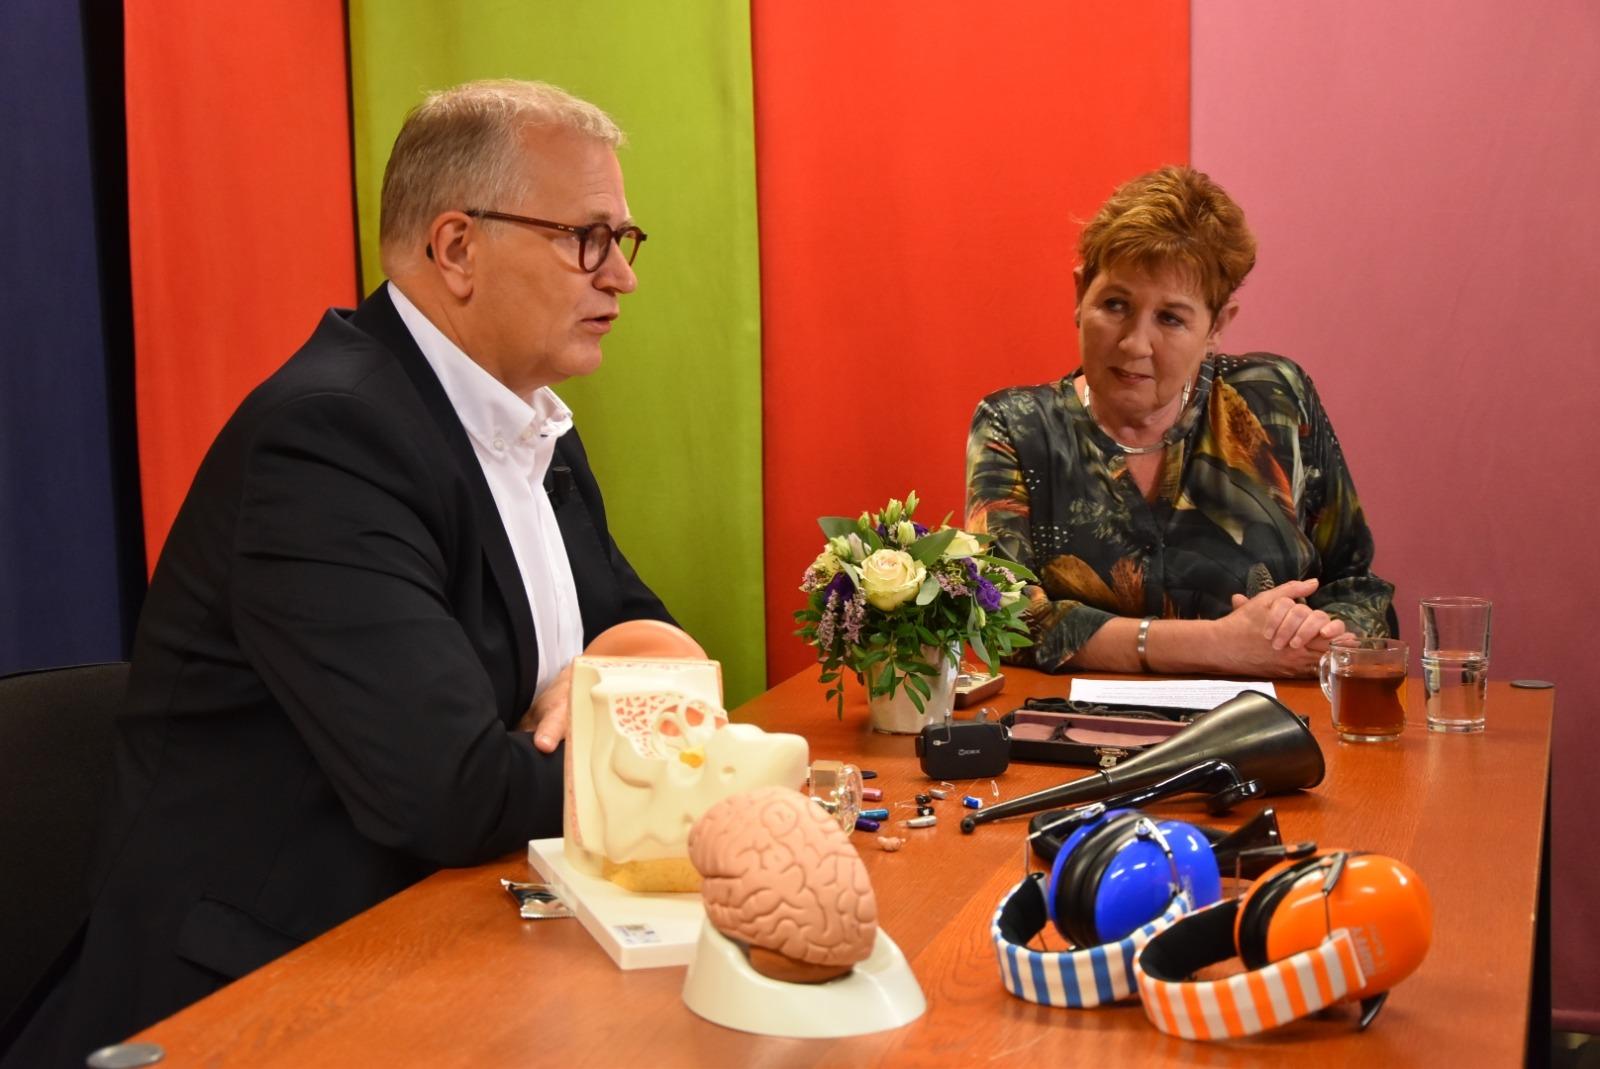 Brabant Oor in gesprek met HTR Media